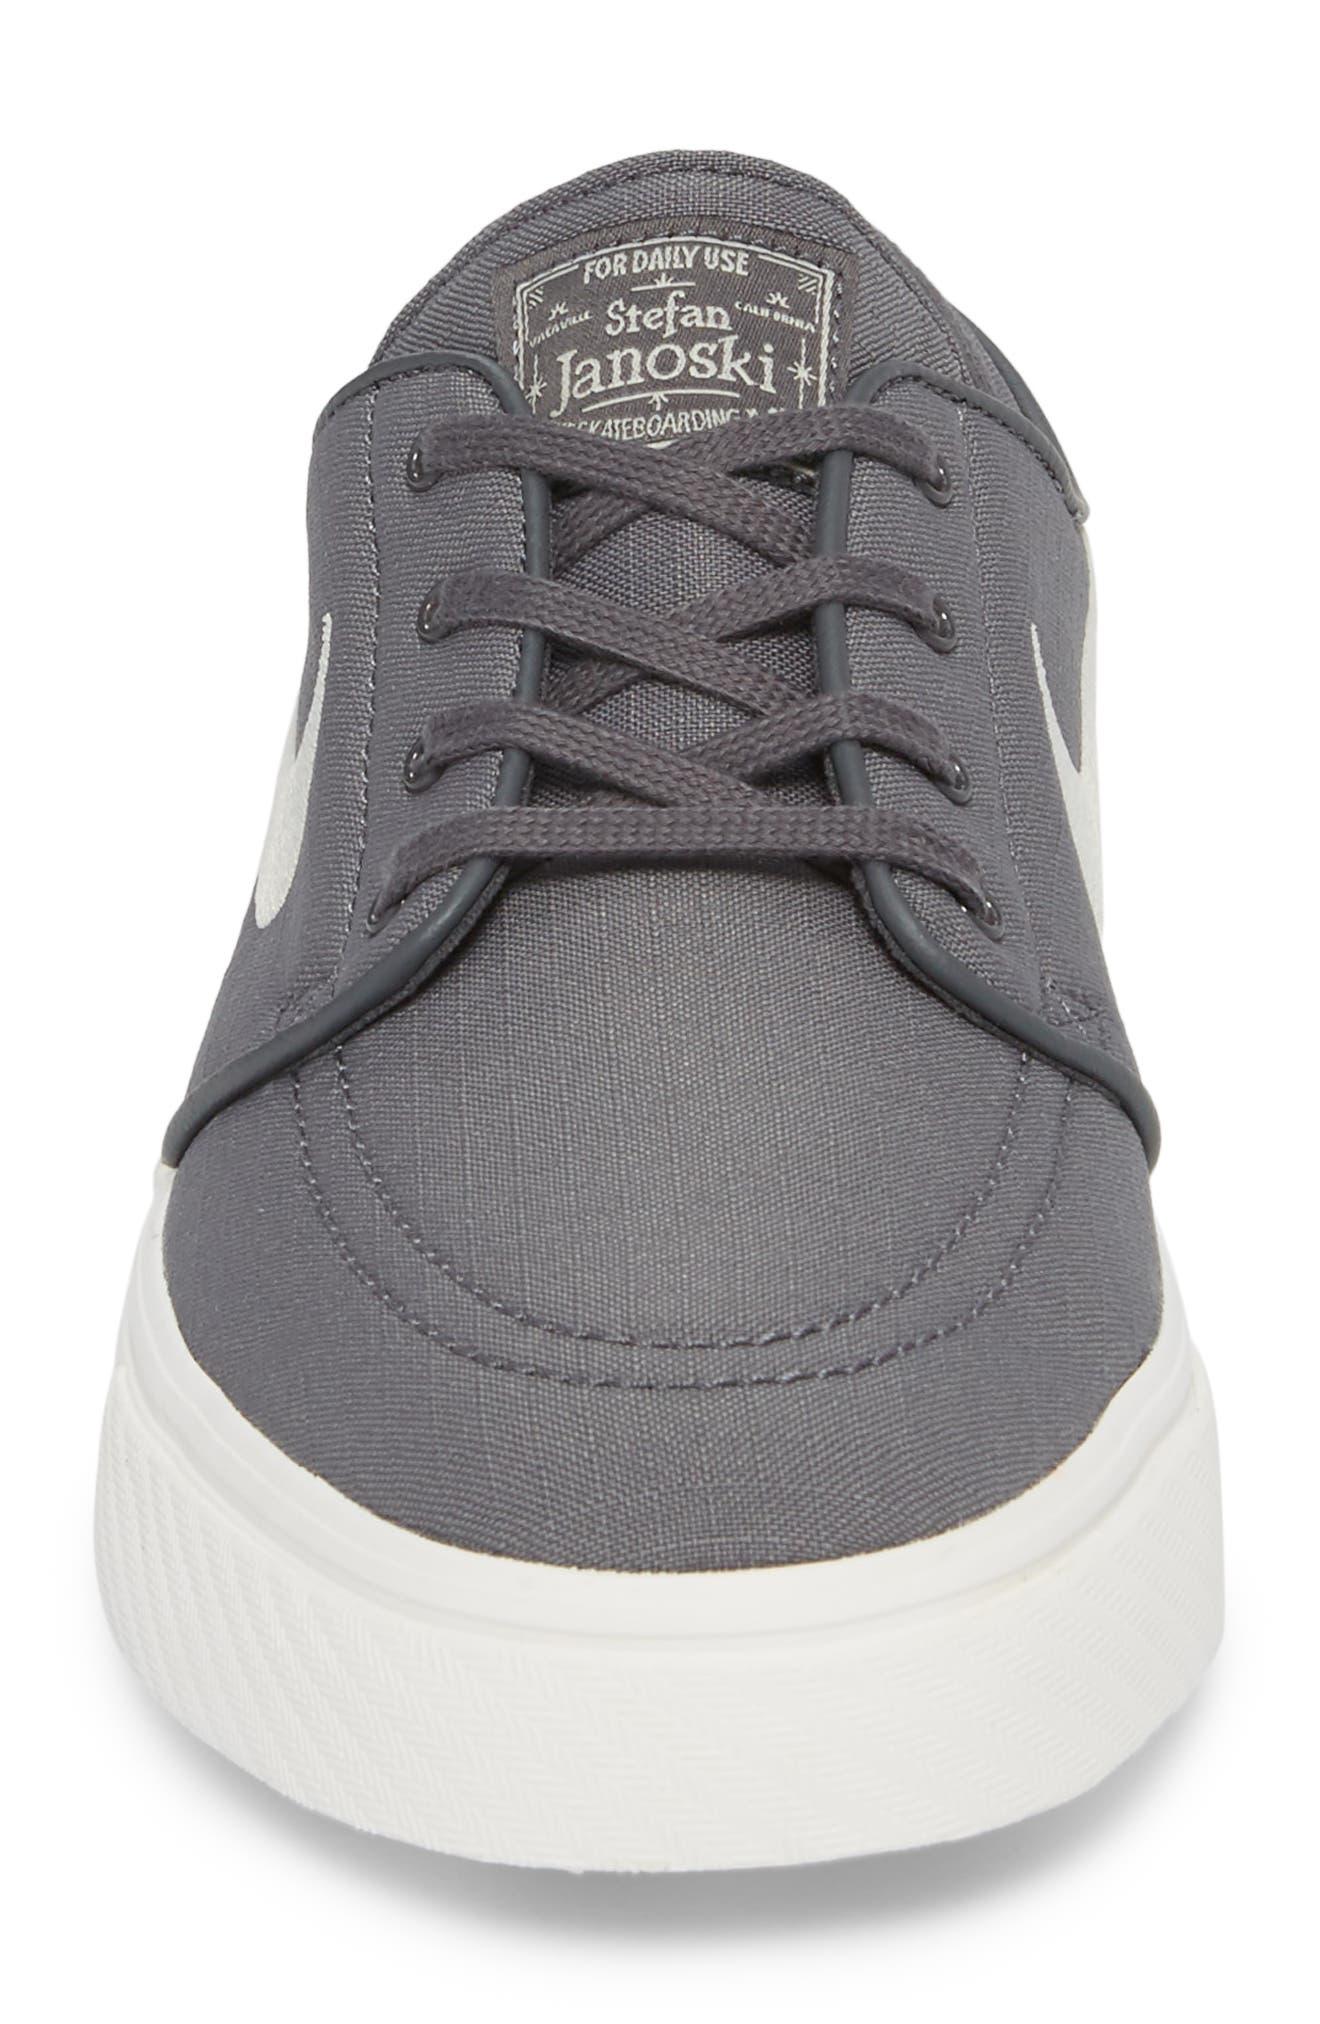 'Zoom - Stefan Janoski SB' Canvas Skate Shoe,                             Alternate thumbnail 4, color,                             Dark Grey/ Bone/ White/ Black